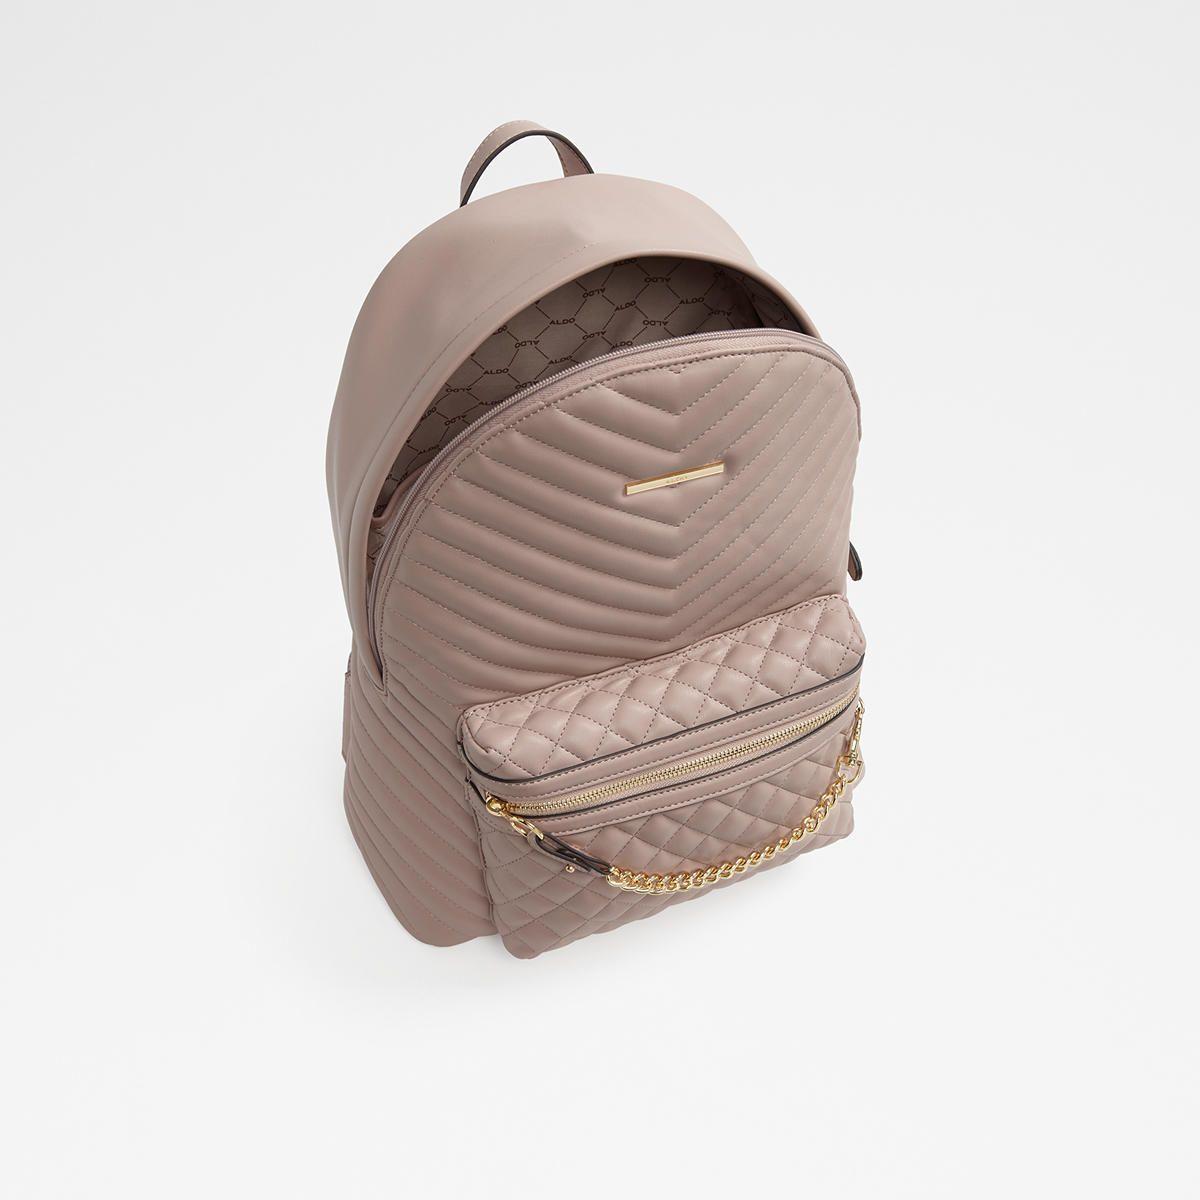 7d1c489c731 Acareria Light Pink Women s Backpacks   Bum Bags